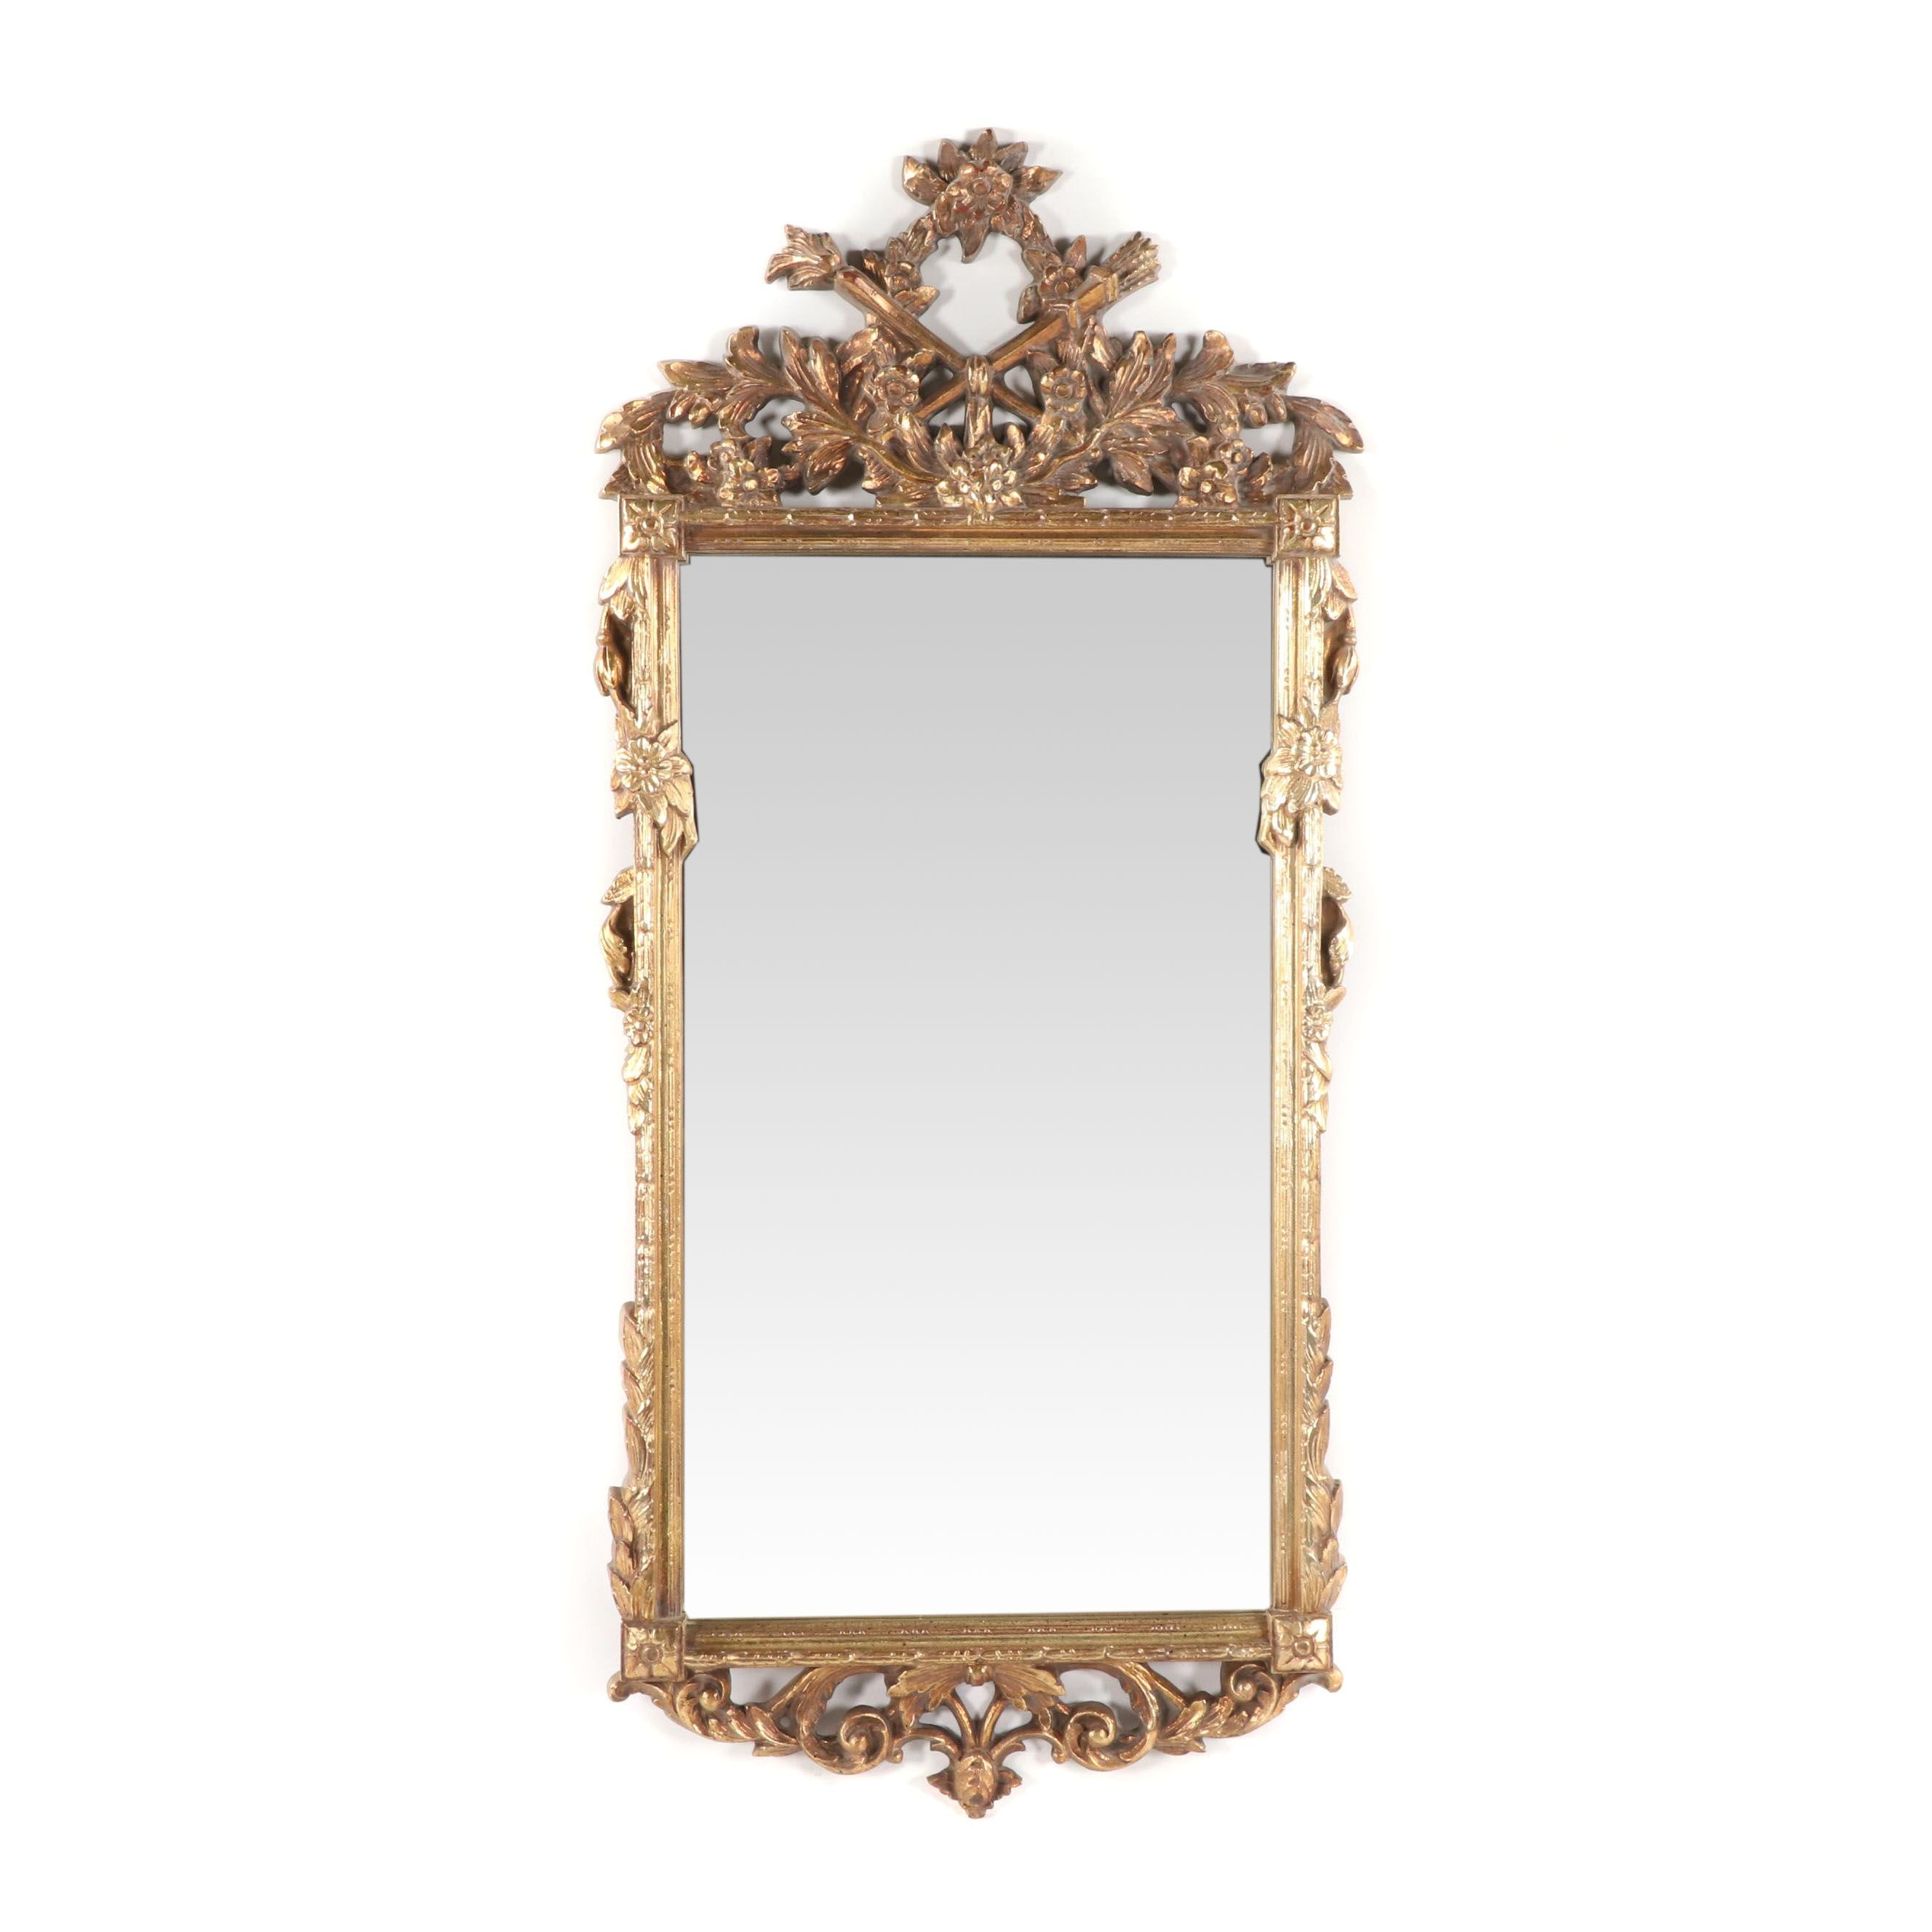 Louis XV Style Gilt Mirror, 21st Century